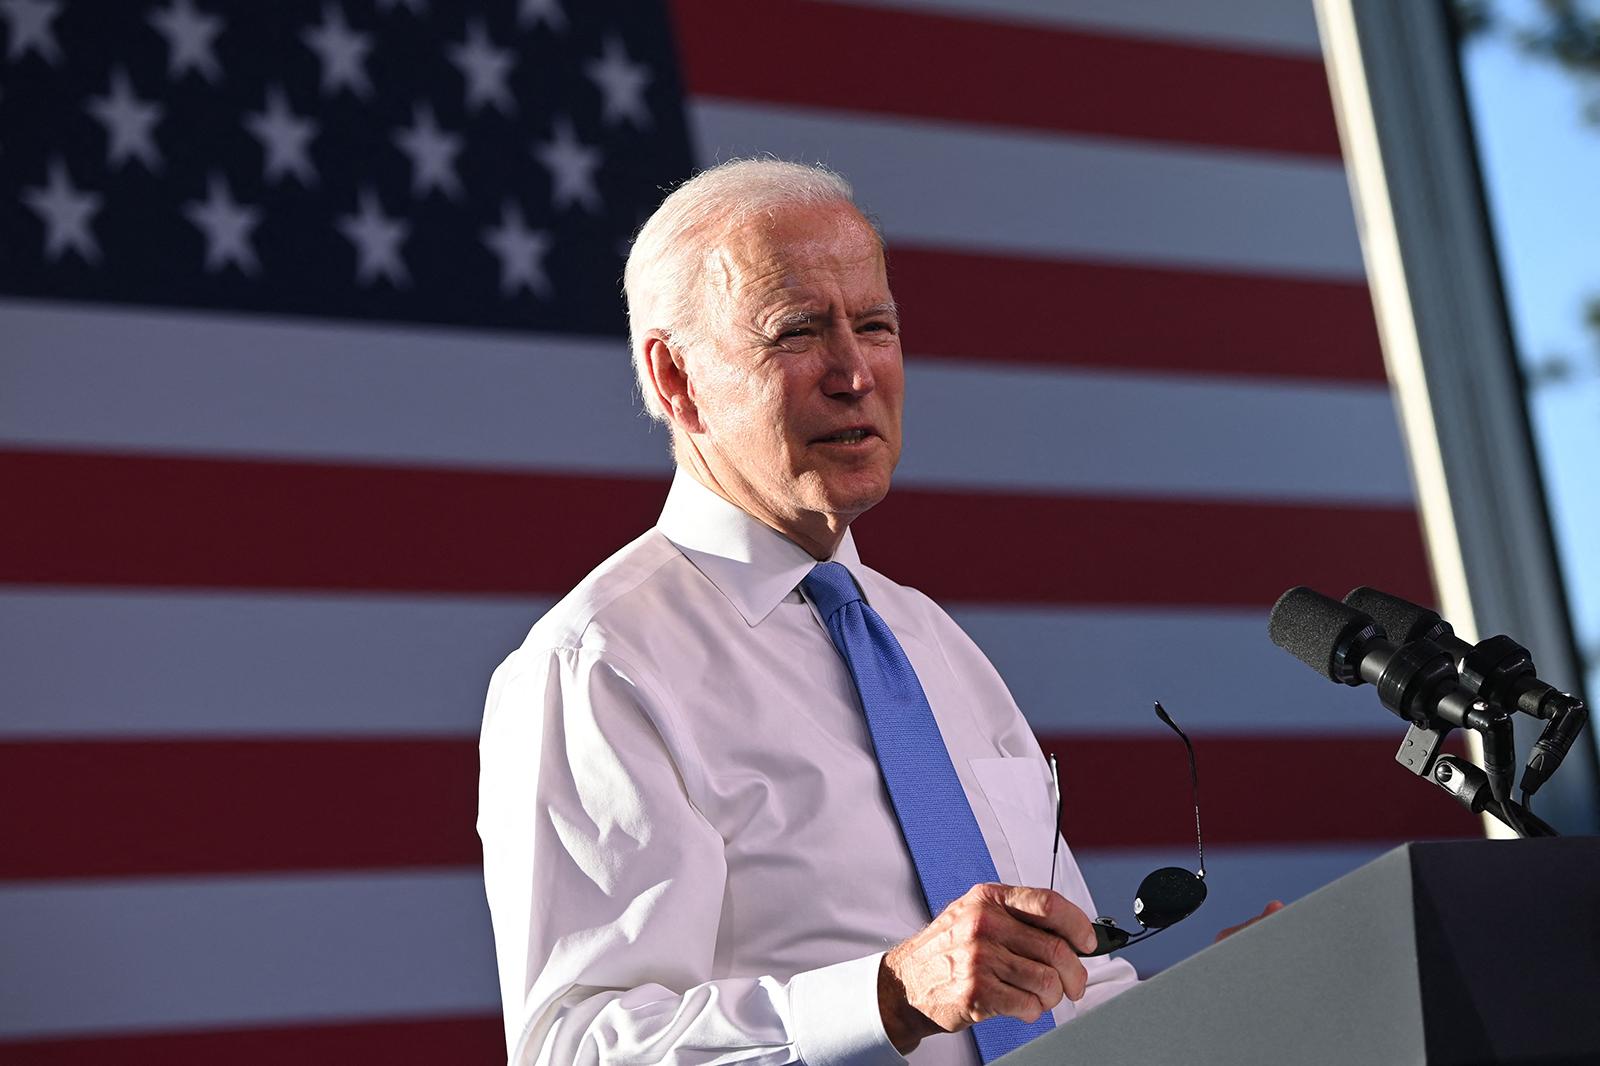 Biden set to push more Americans to get Covid-19 vaccine in North Carolina speech